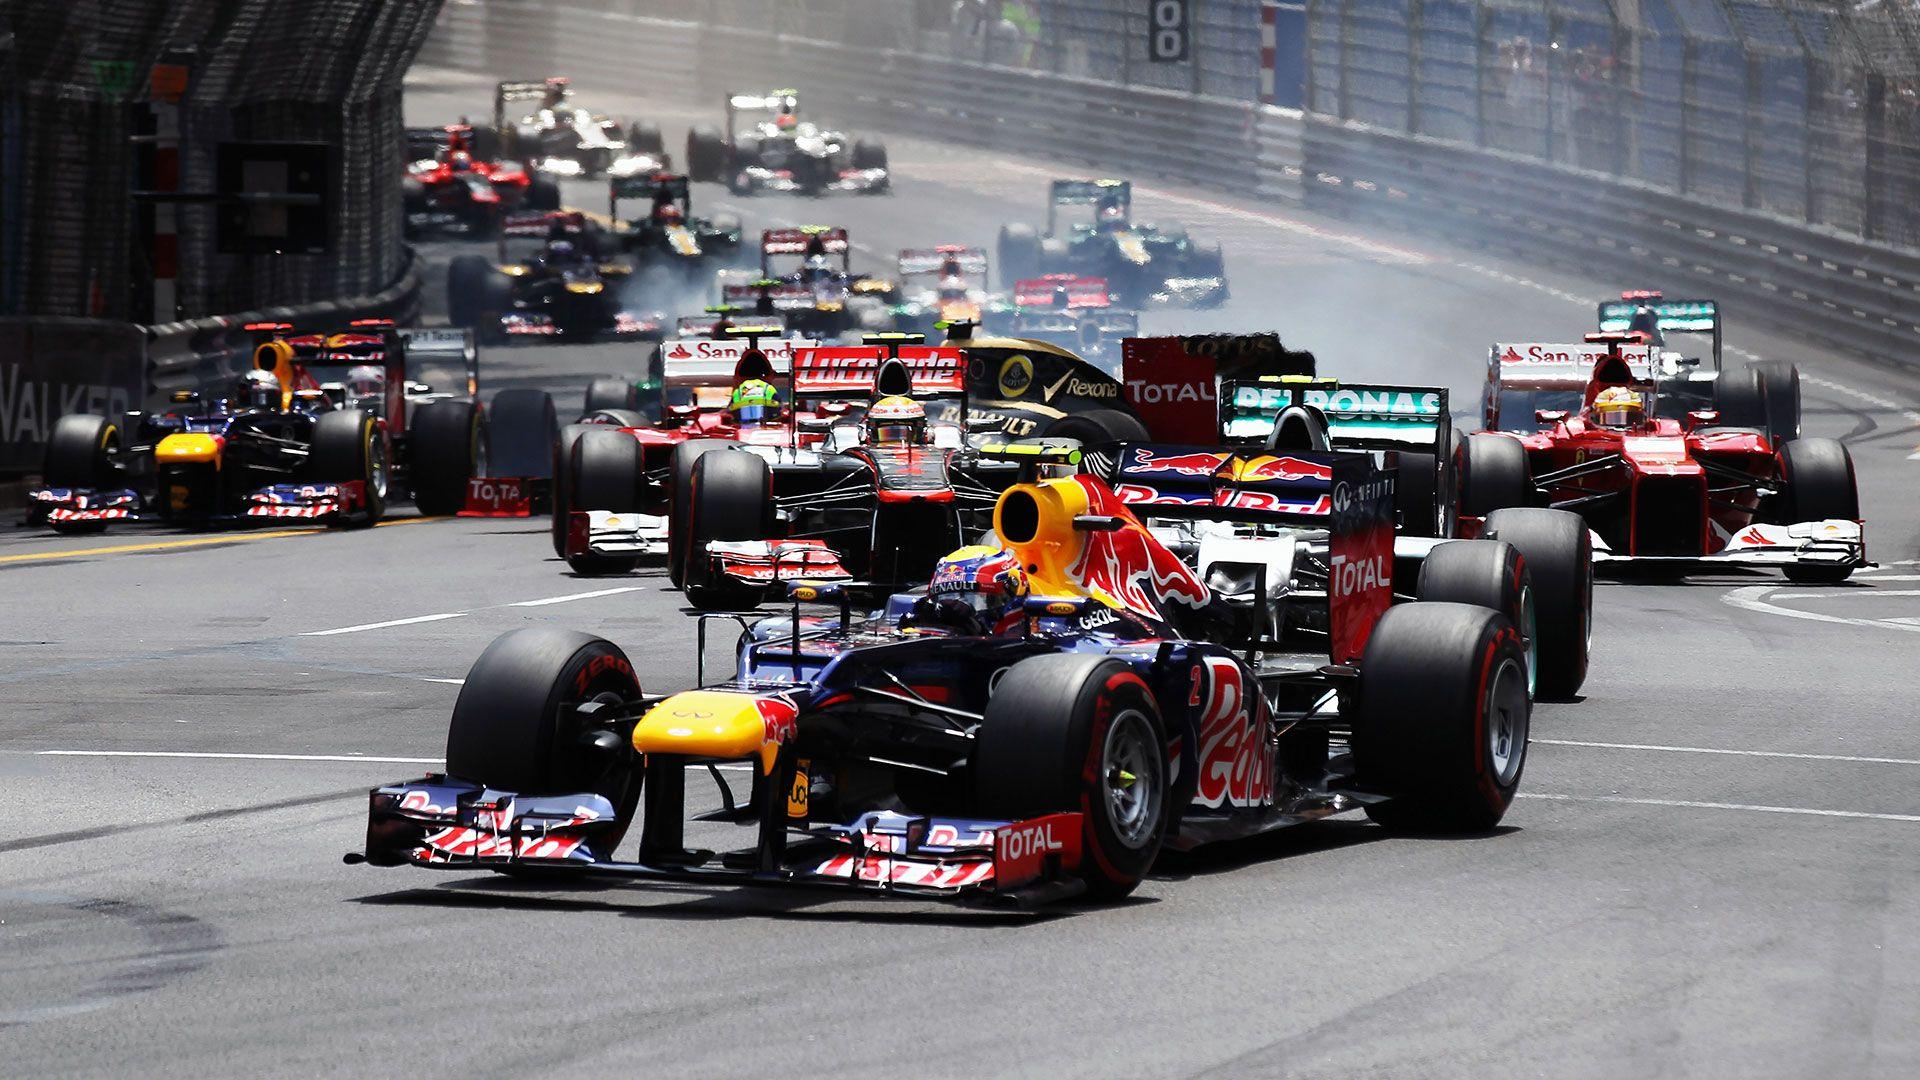 Formula 1 Monaco Start Miejsca Do Odwiedzenia Gran Premio Gran Premio De Mexico Y F1 Wallpaper Hd